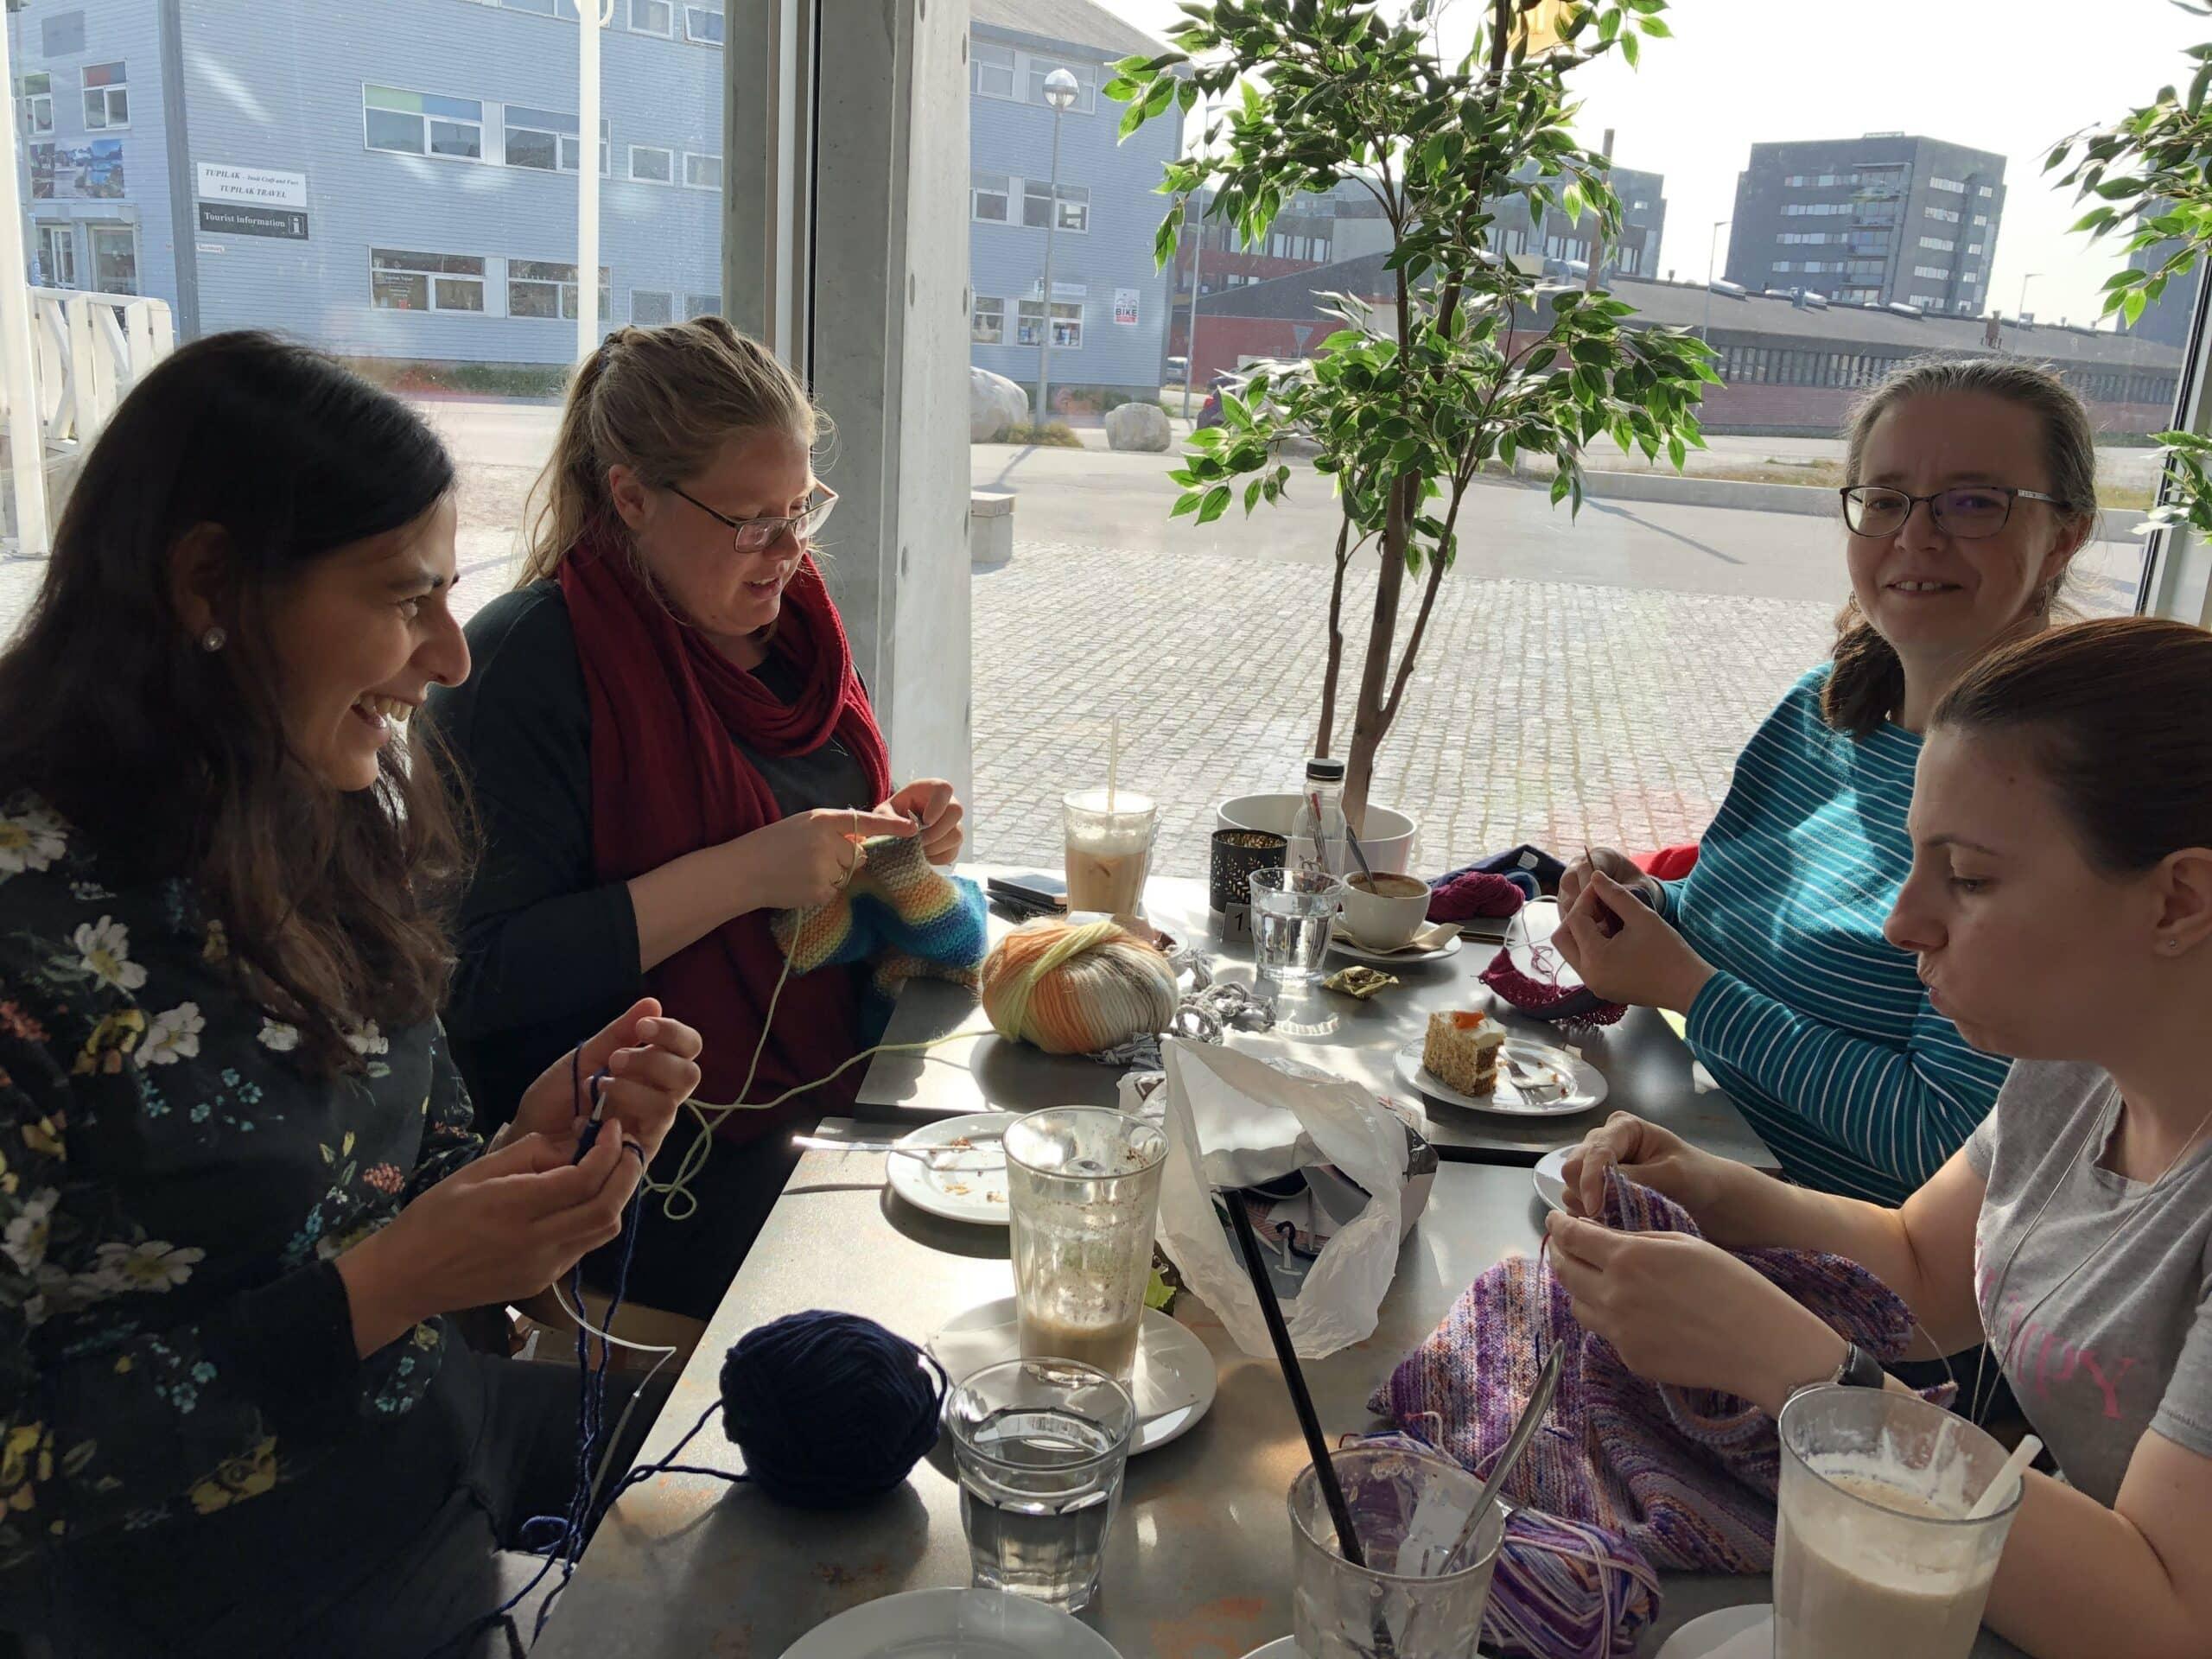 Knitting in Greenland